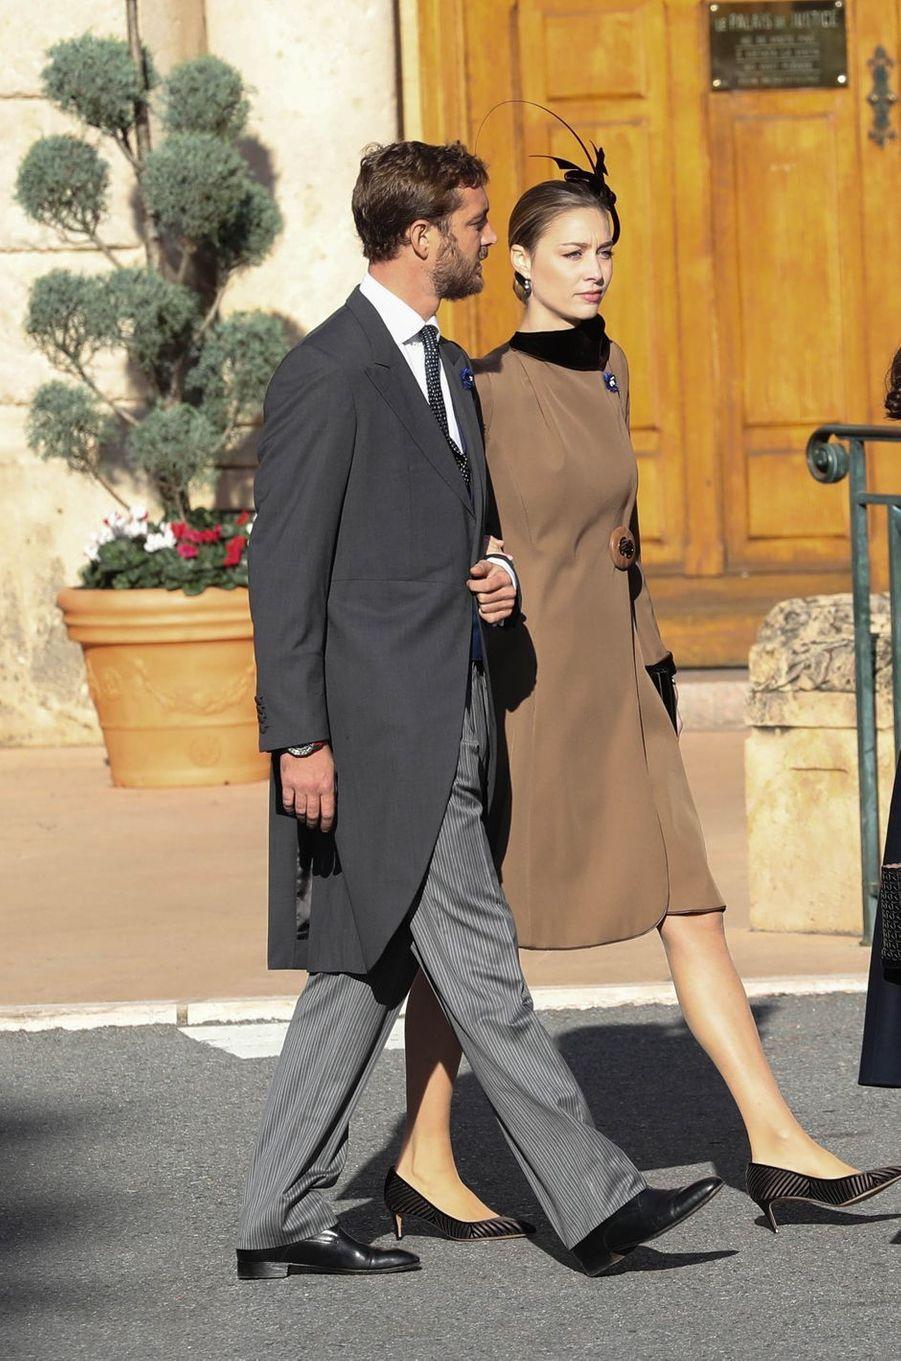 Pierre Casiraghi et sa femme Beatrice Borromeo à Monaco, le 19 novembre 2018